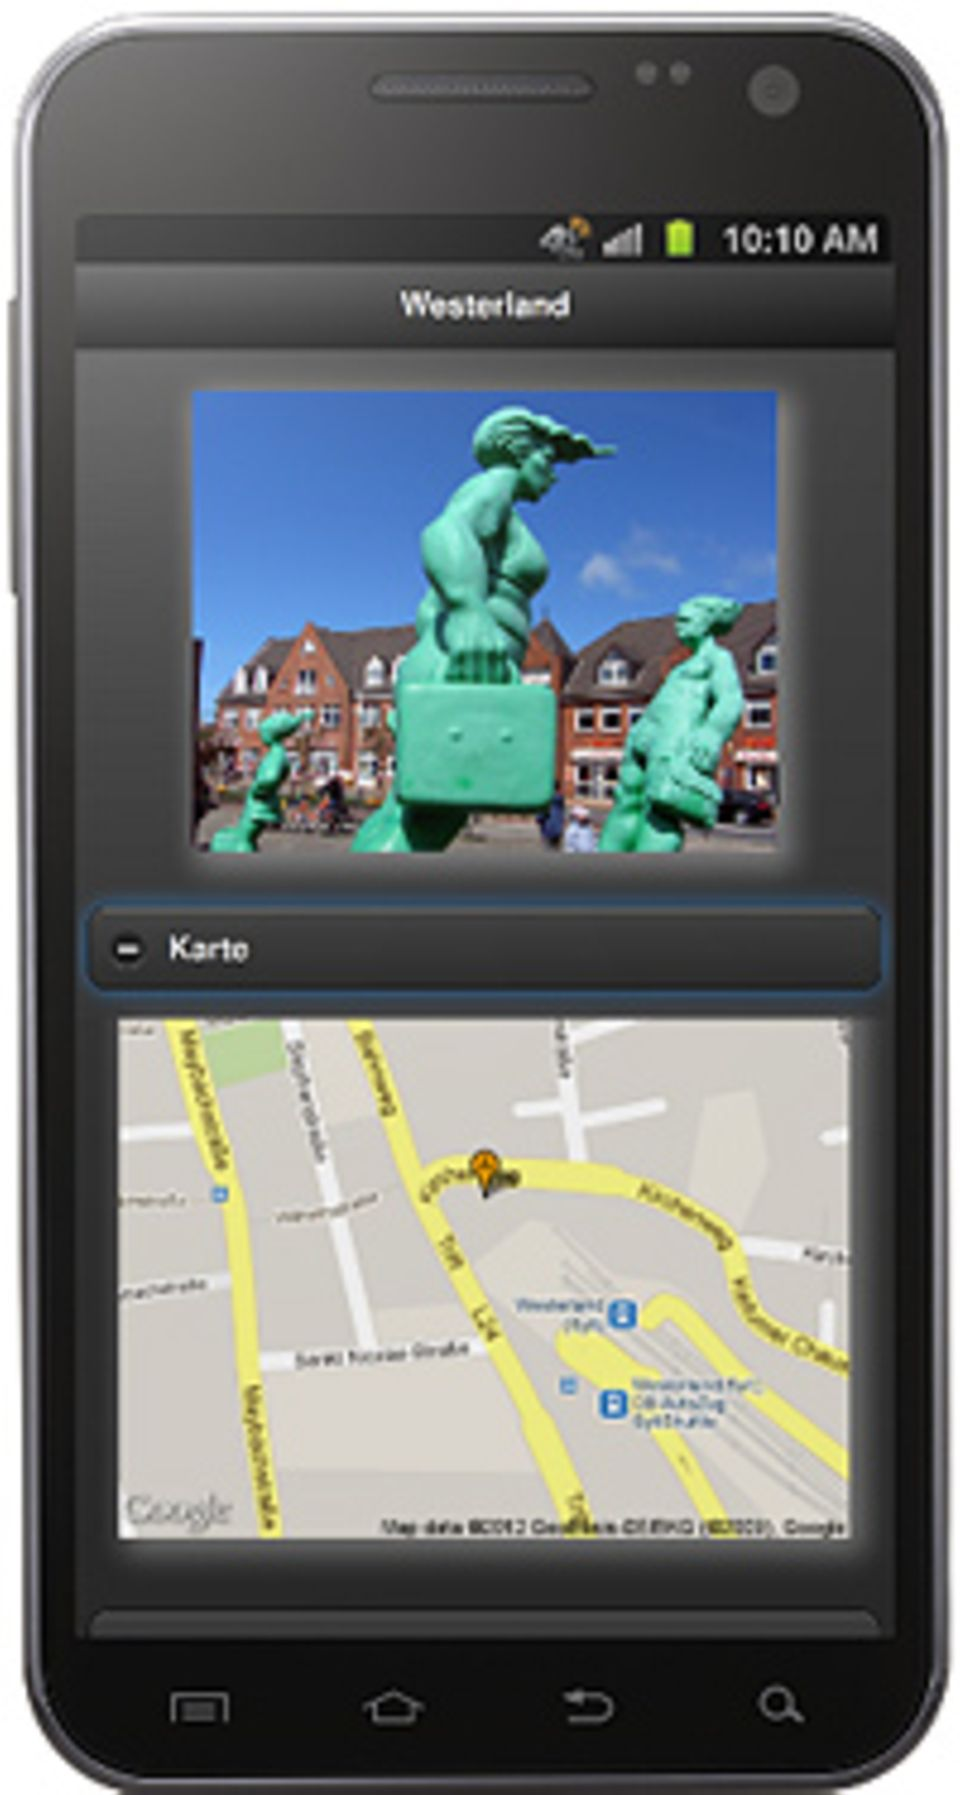 Schnitzeljagd per App, so lässt sich sogar die eigene Stadt neu entdecken